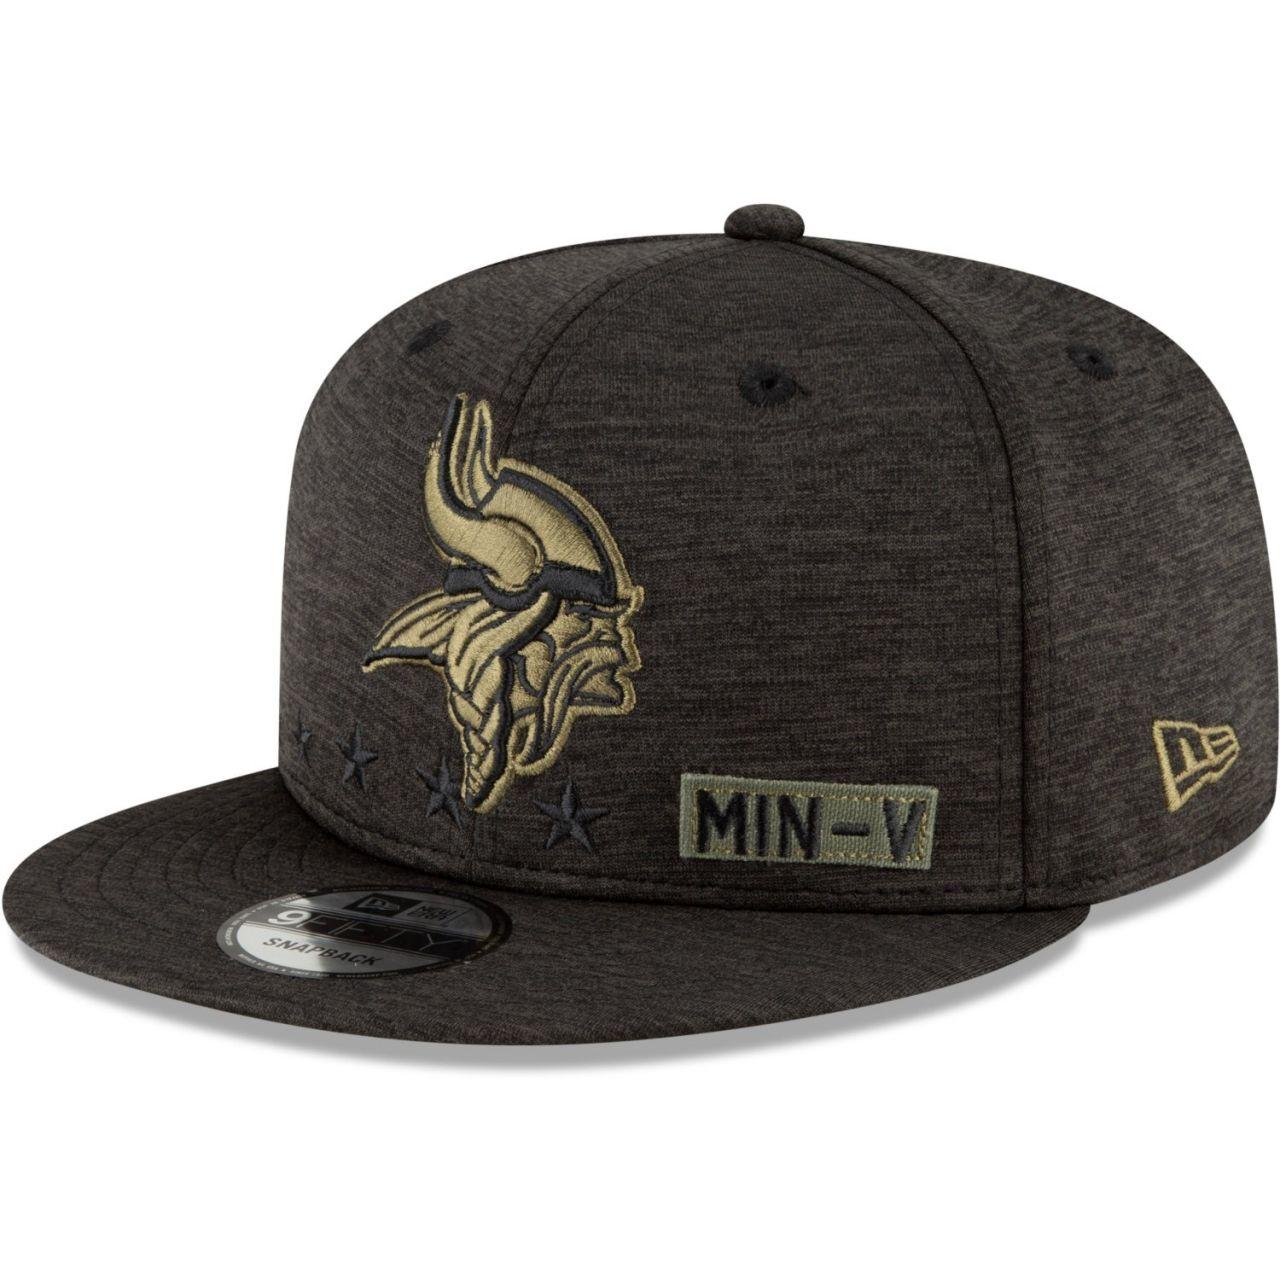 amfoo - New Era 9FIFTY Cap Salute to Service Minnesota Vikings